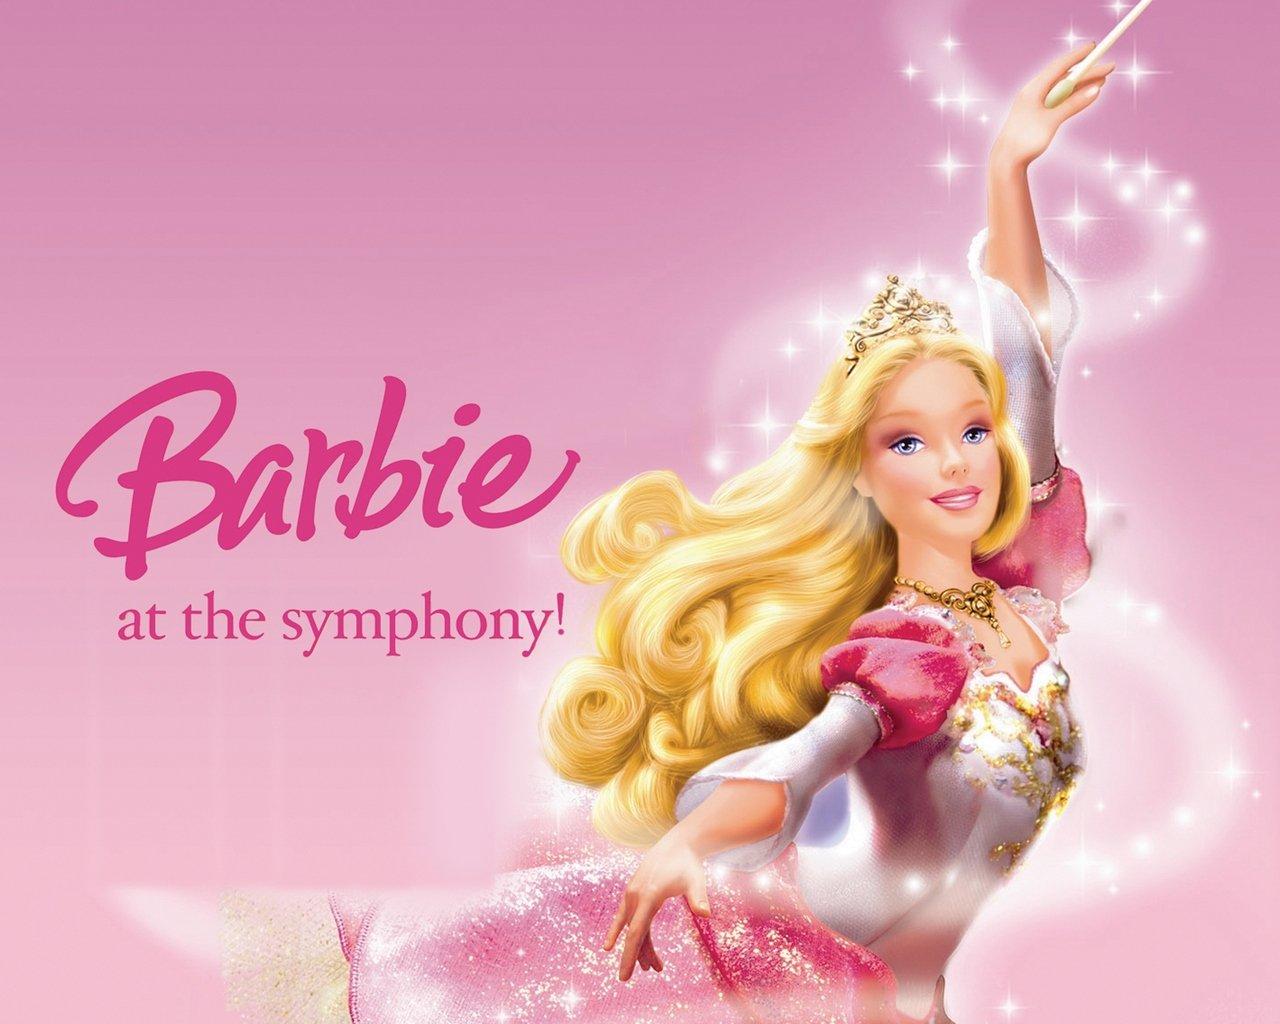 Beautiful Barbie Wallpaper PC 8197 Wallpaper WallpaperLepi 1280x1024